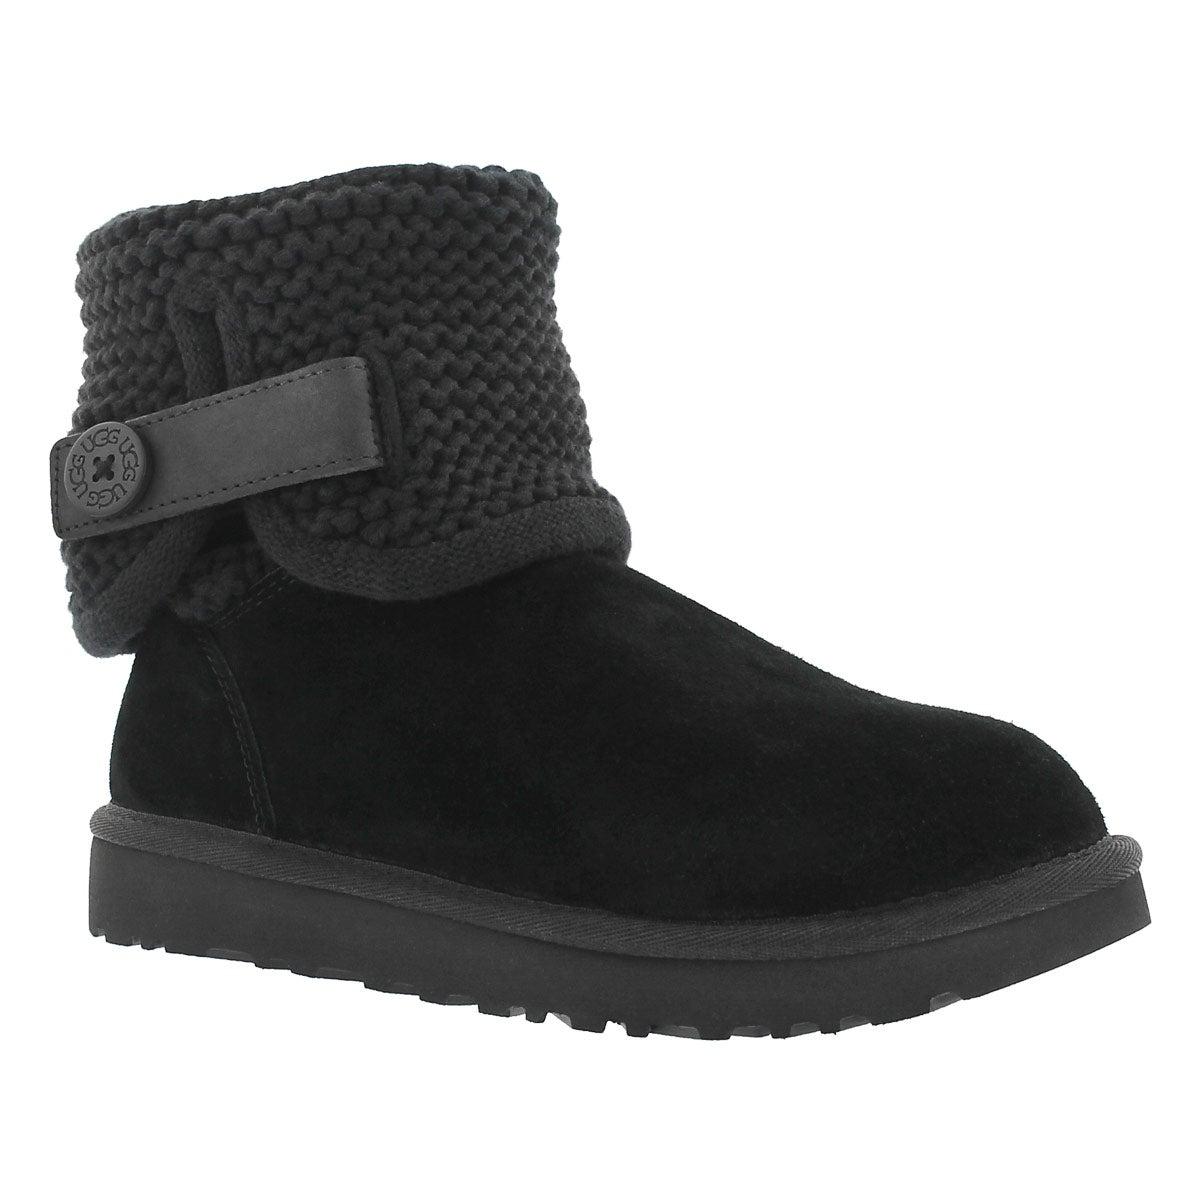 Lds Shaina blk knit folded collar boot